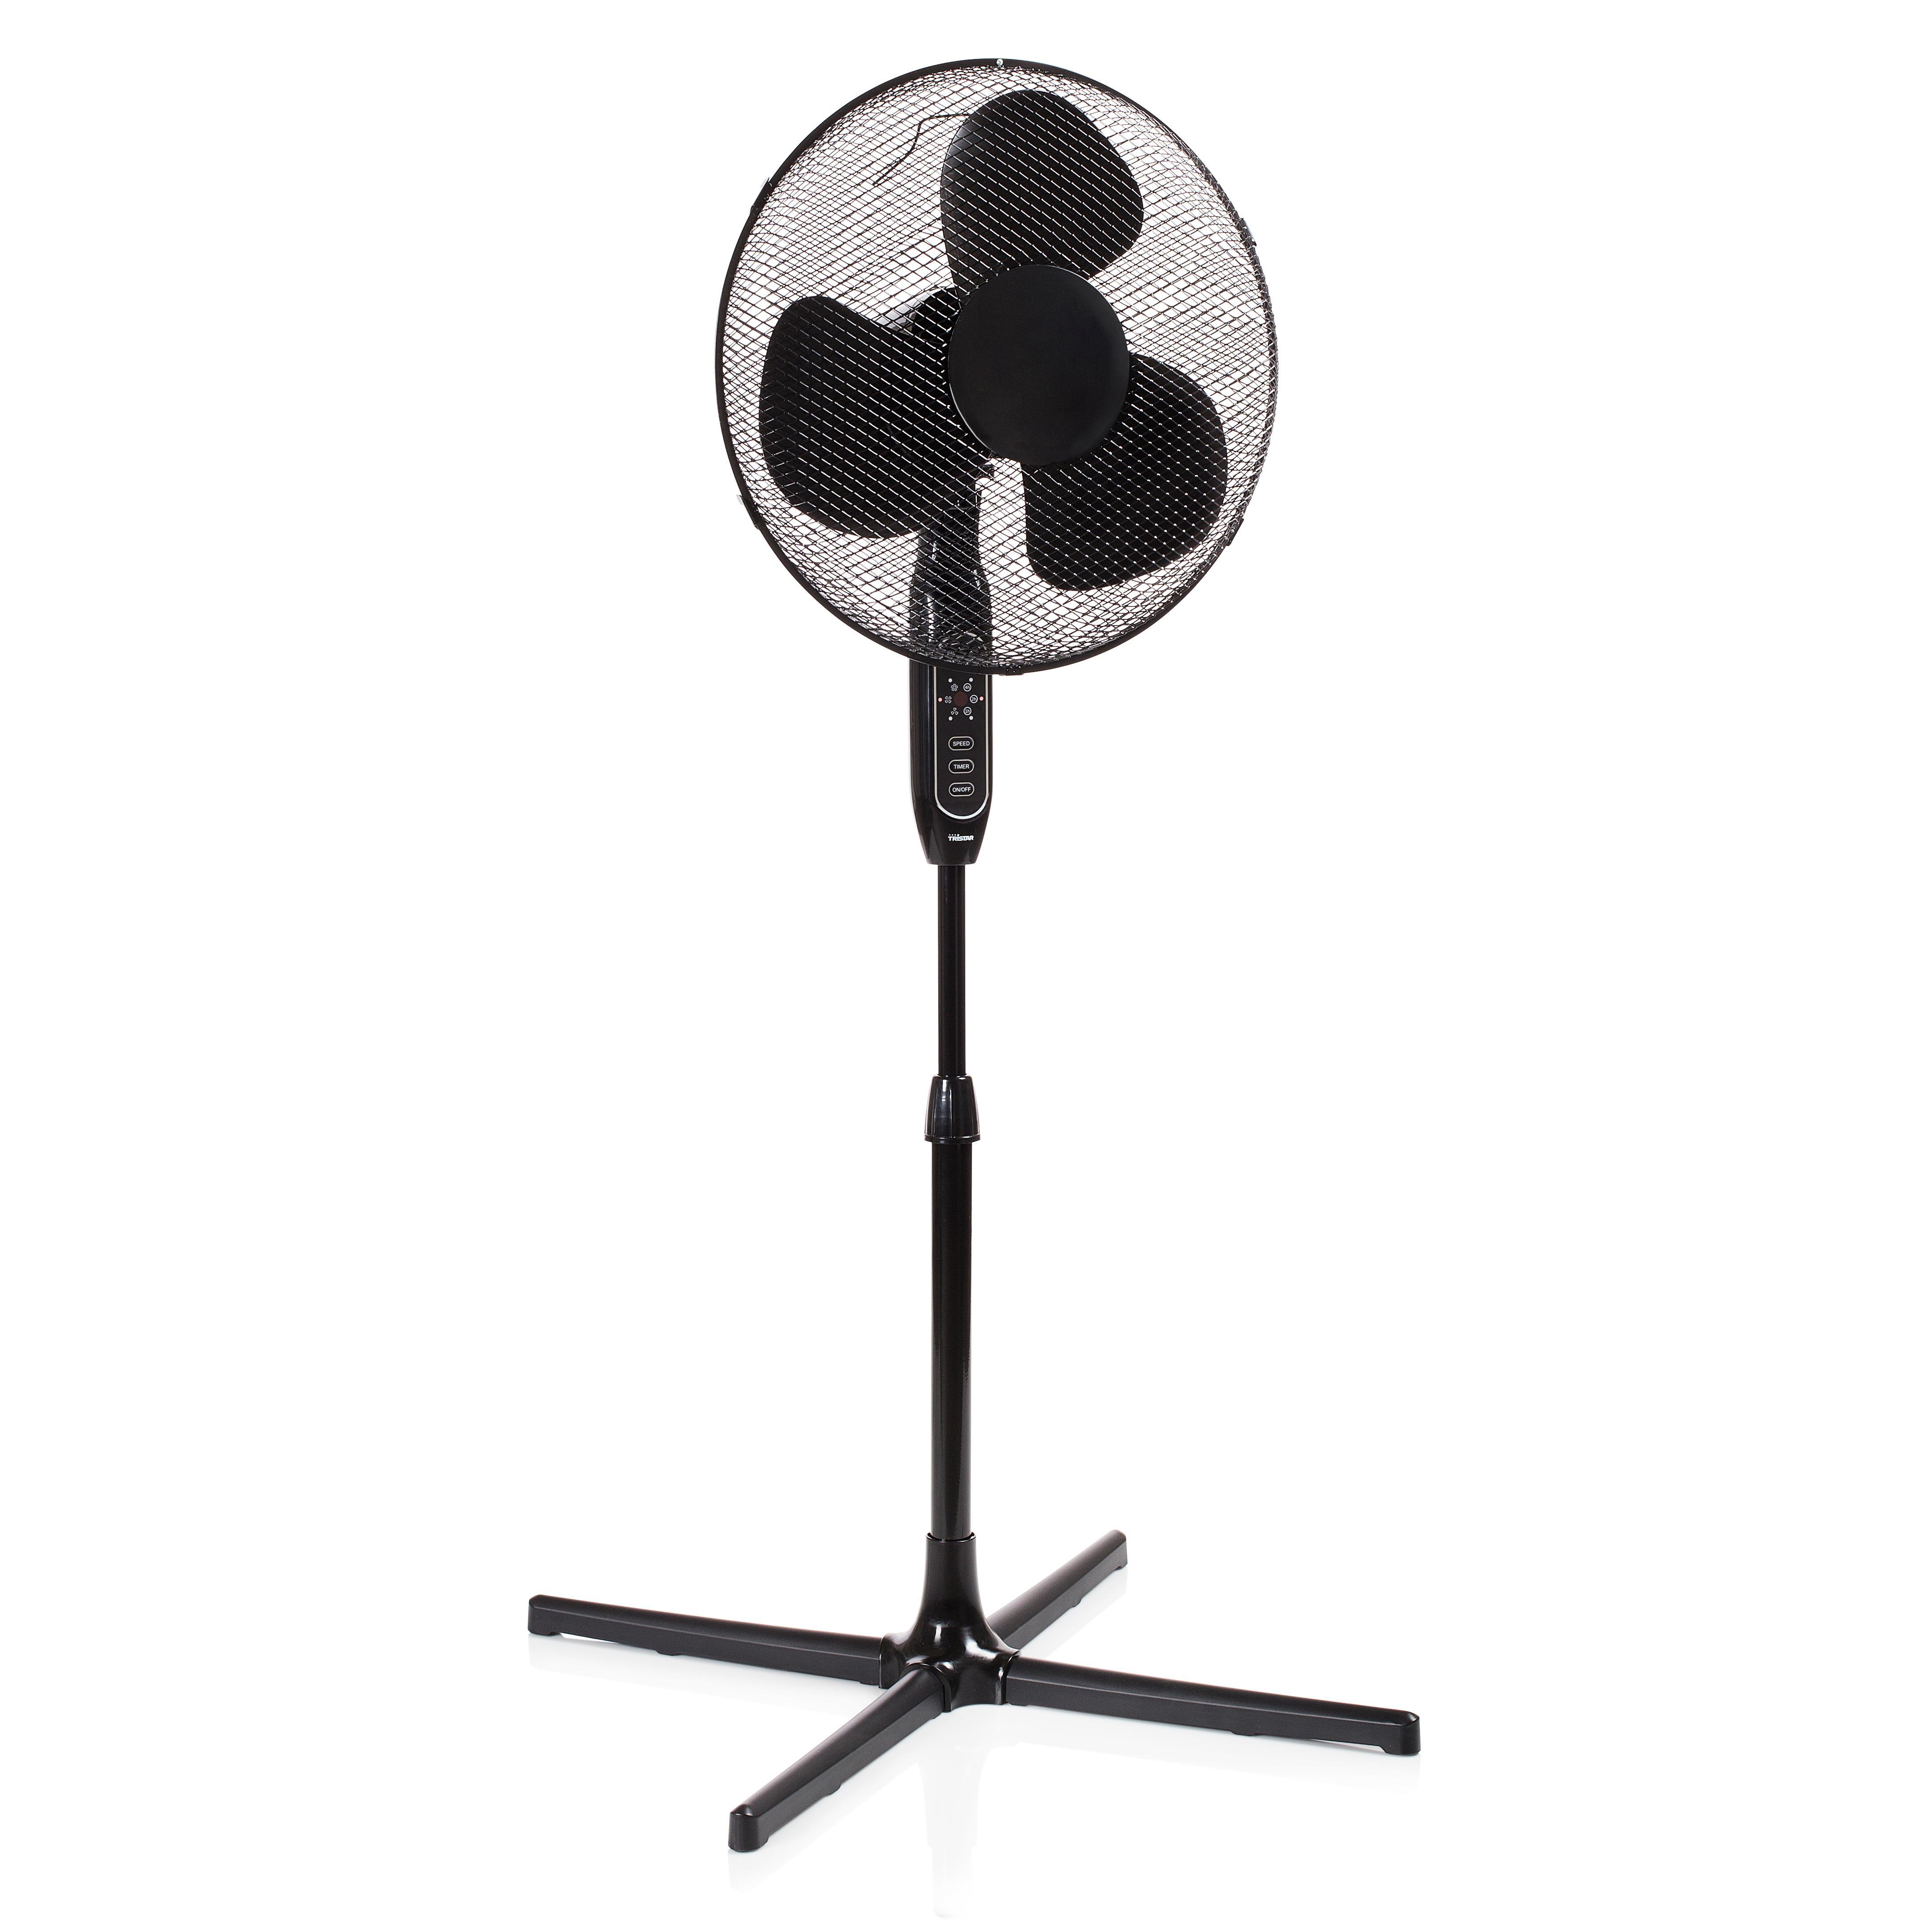 Ventilador de pie Tristar VE 5889 – 40 centímetros – Control ...